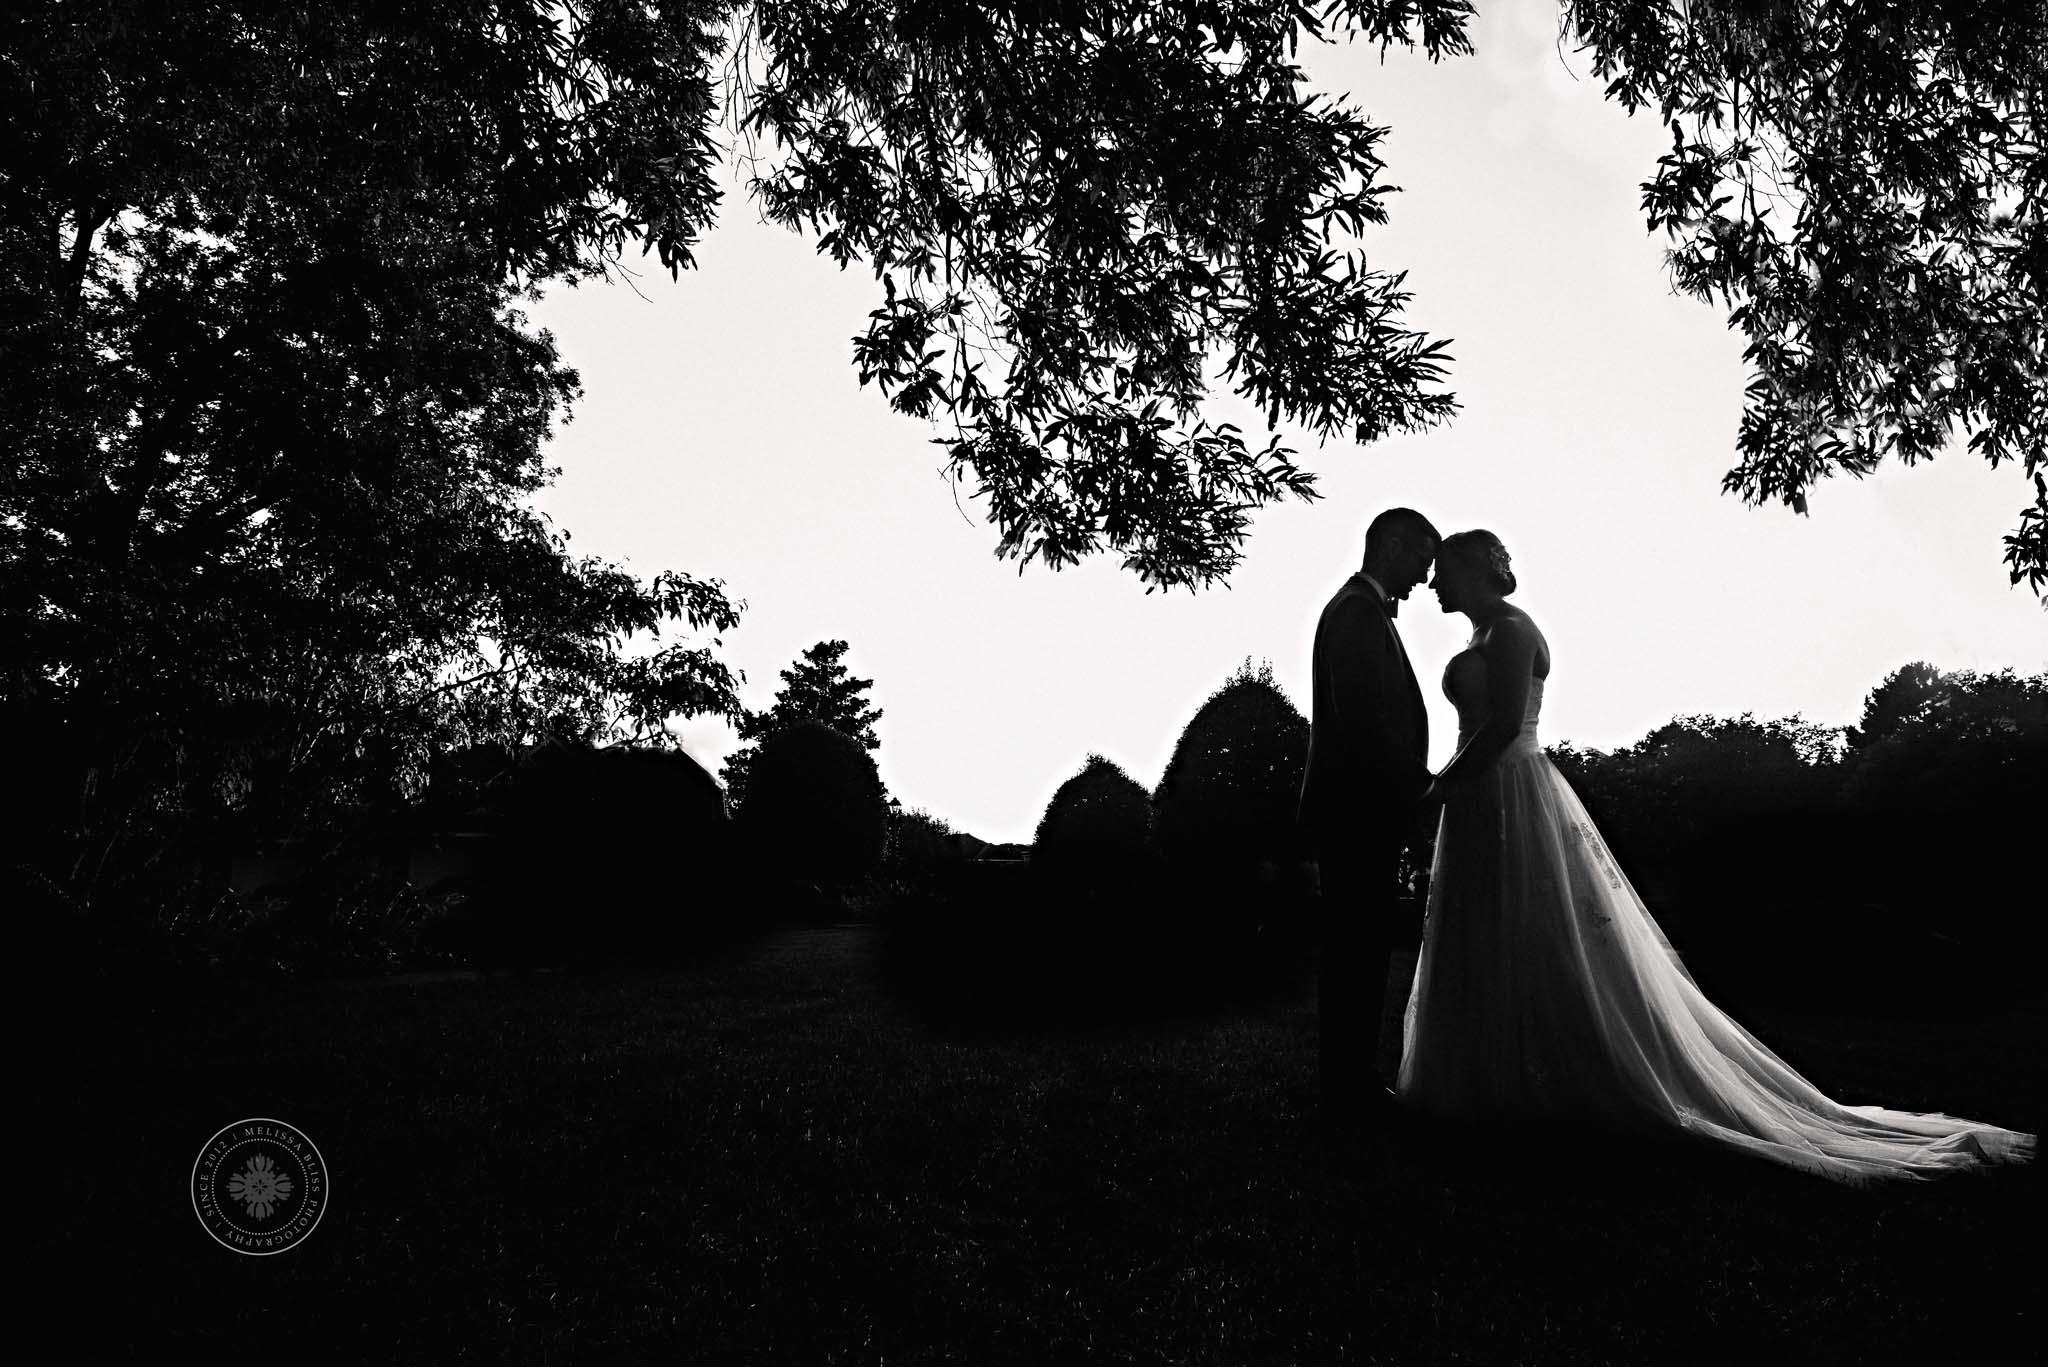 virginia-beach-wedding-photographer-melissa-bliss-photography-artistic-beautiful-wedding-photography-norfolk-portsmouth-chesapeake-sandbridge-wedding-photographers